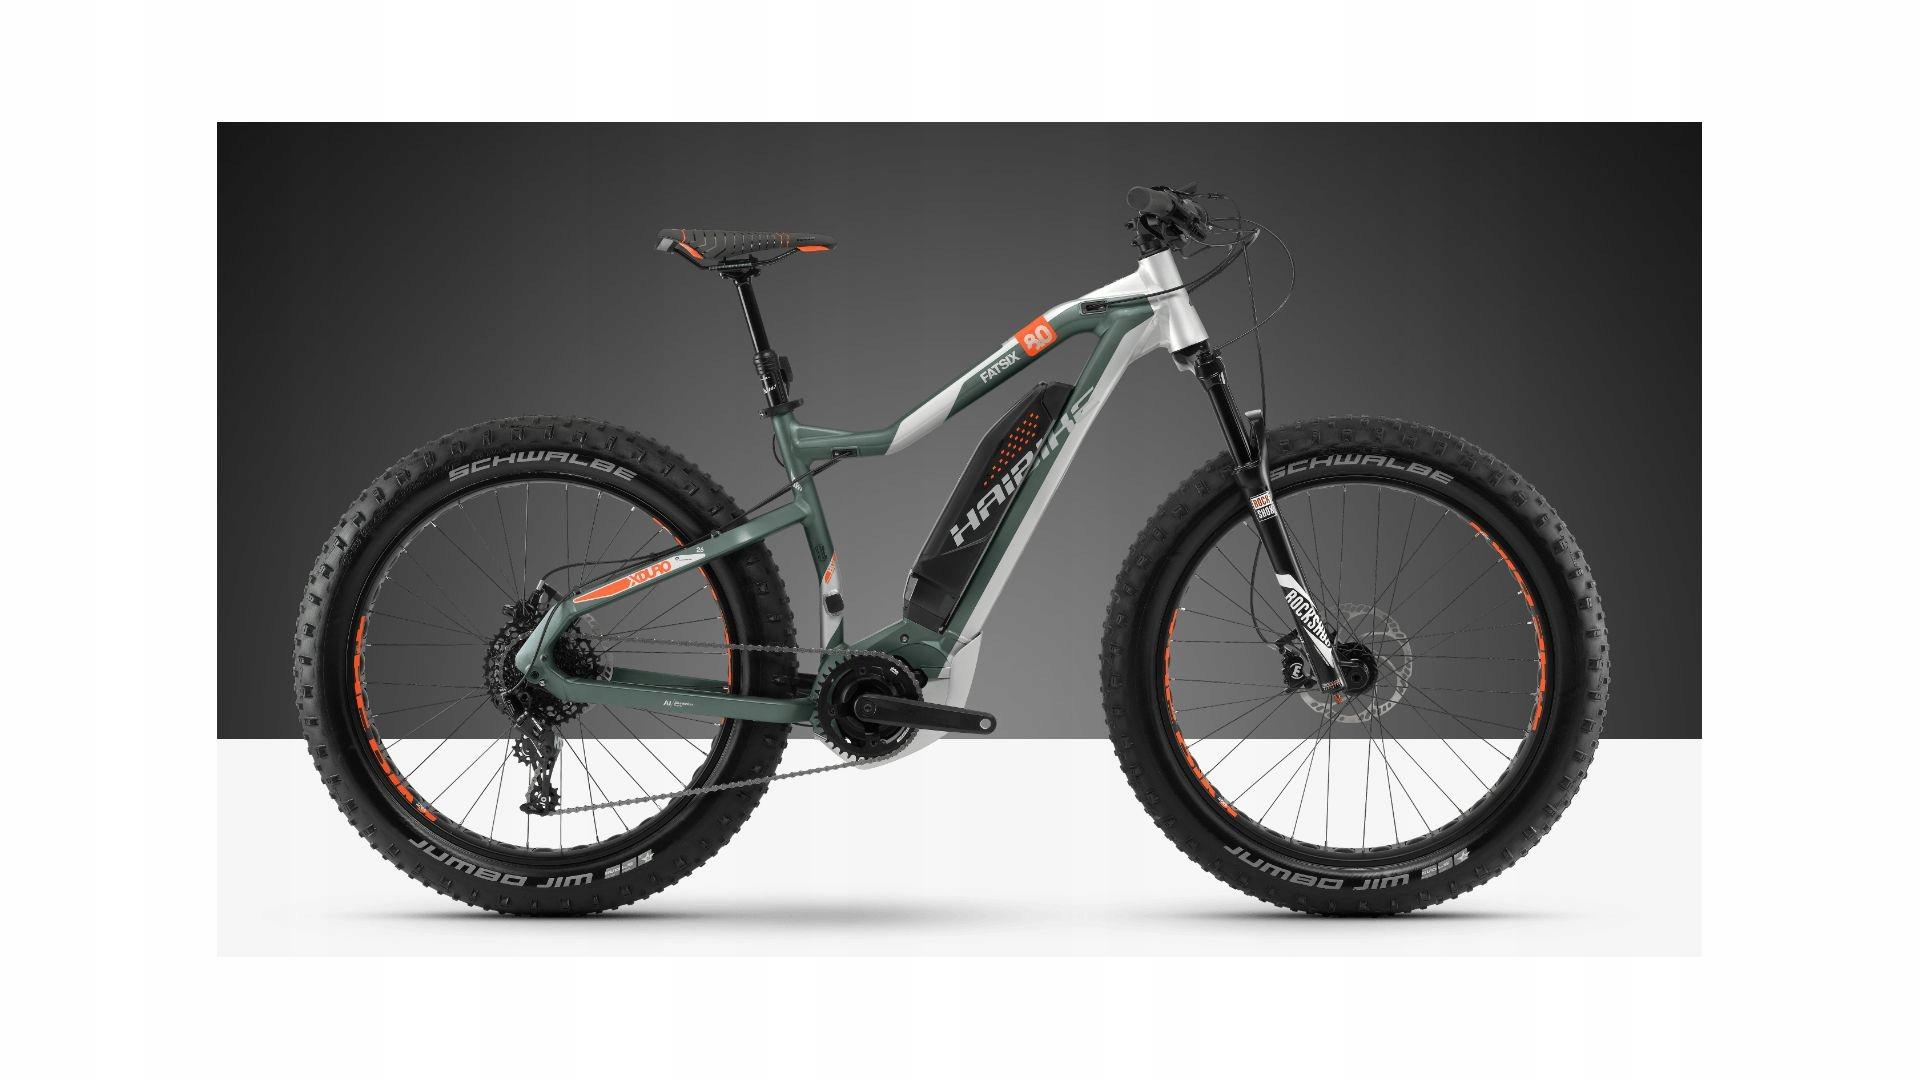 Rower elektryczny fatbike Haibike Fatsix 8.0 45kmh